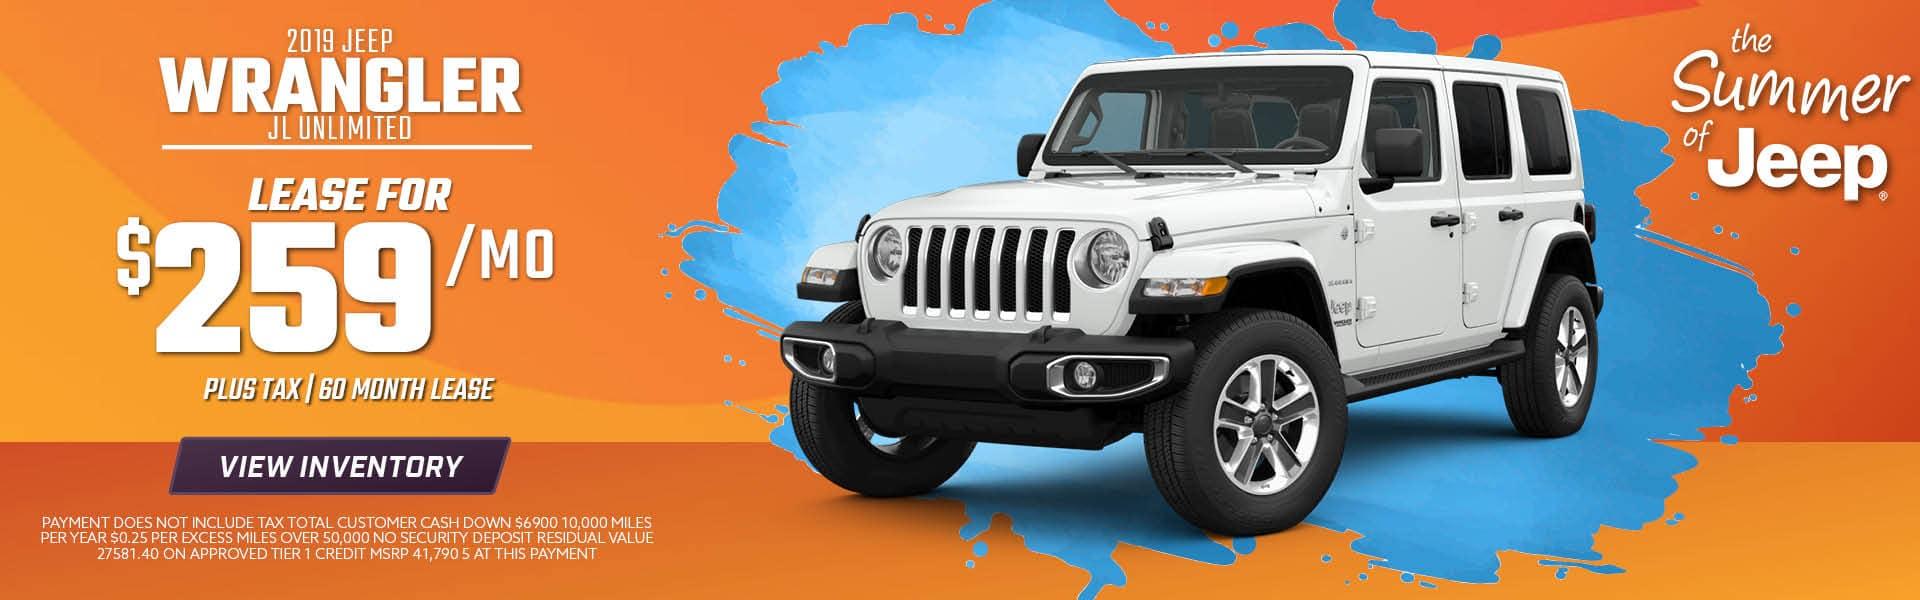 2019 Jeep Wrangler Special in Norco, CA